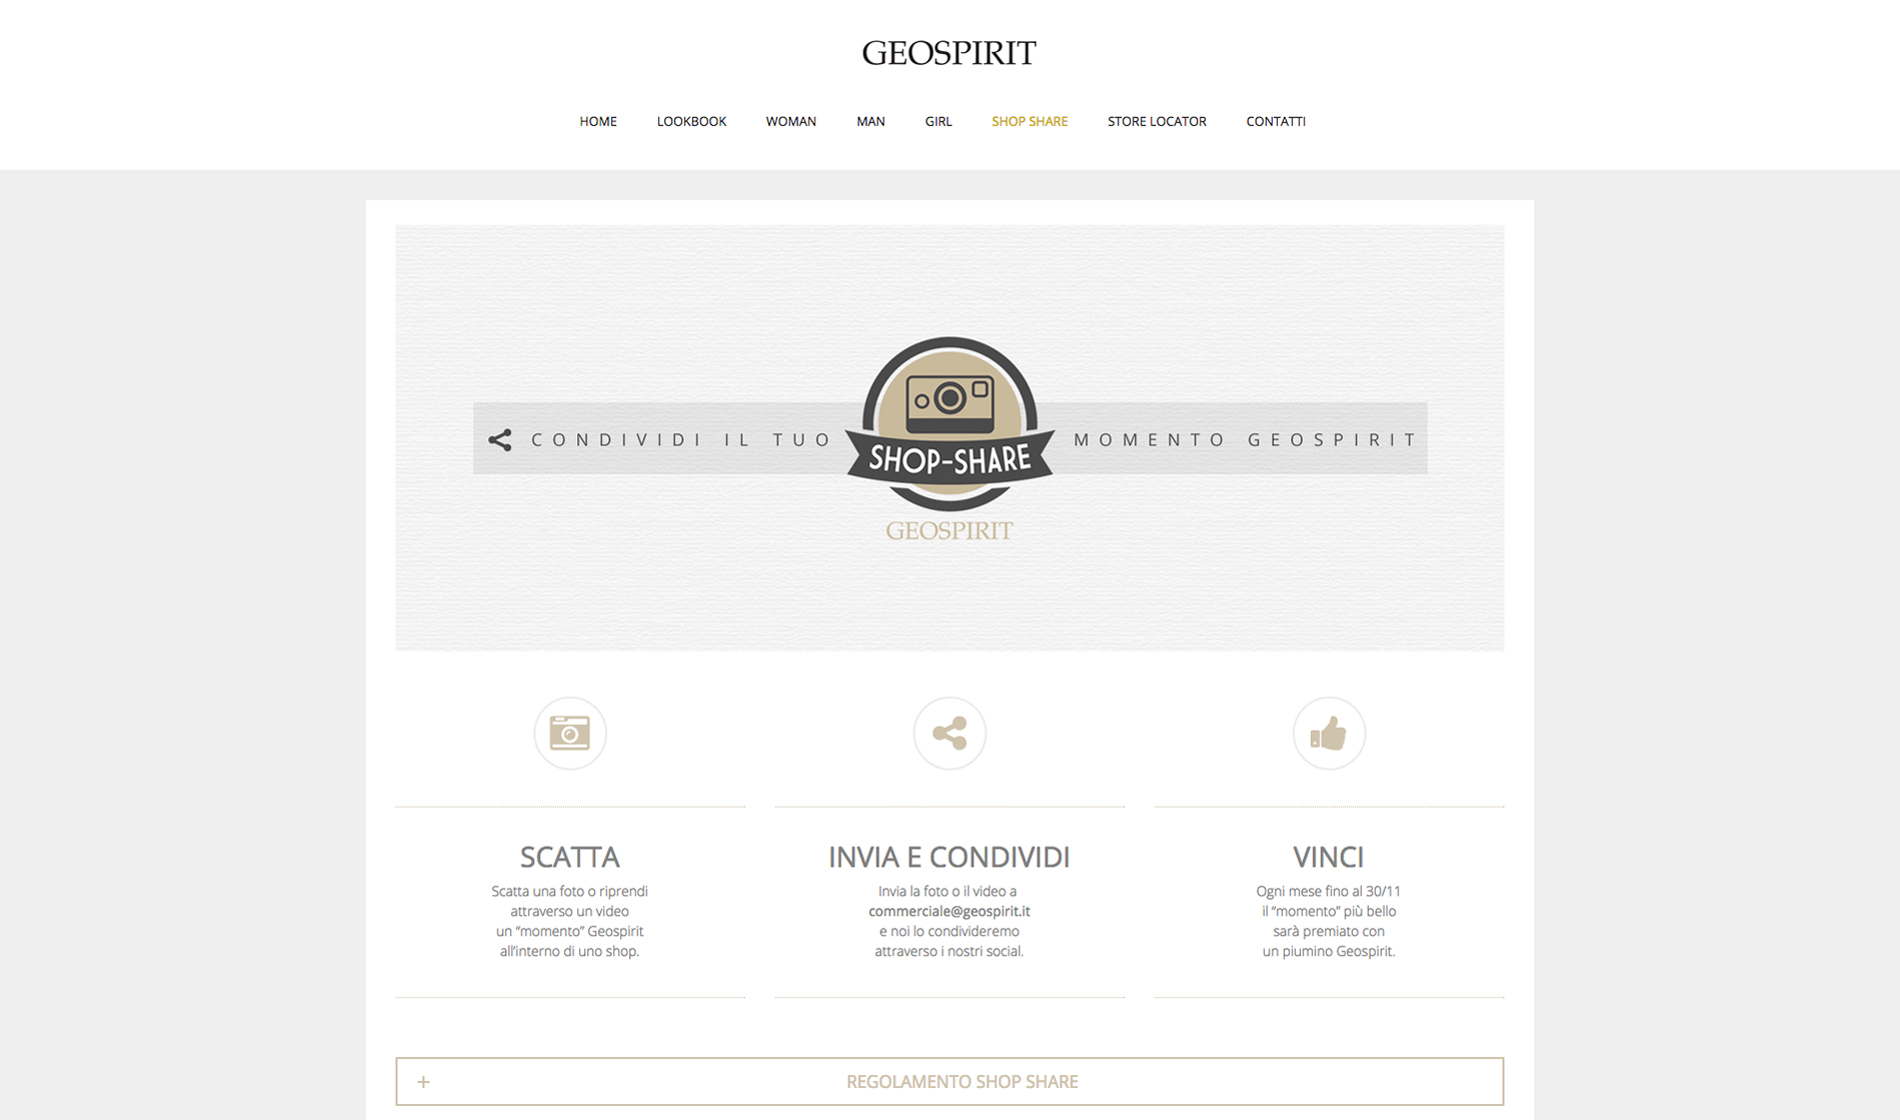 geospirit sito web shopshare